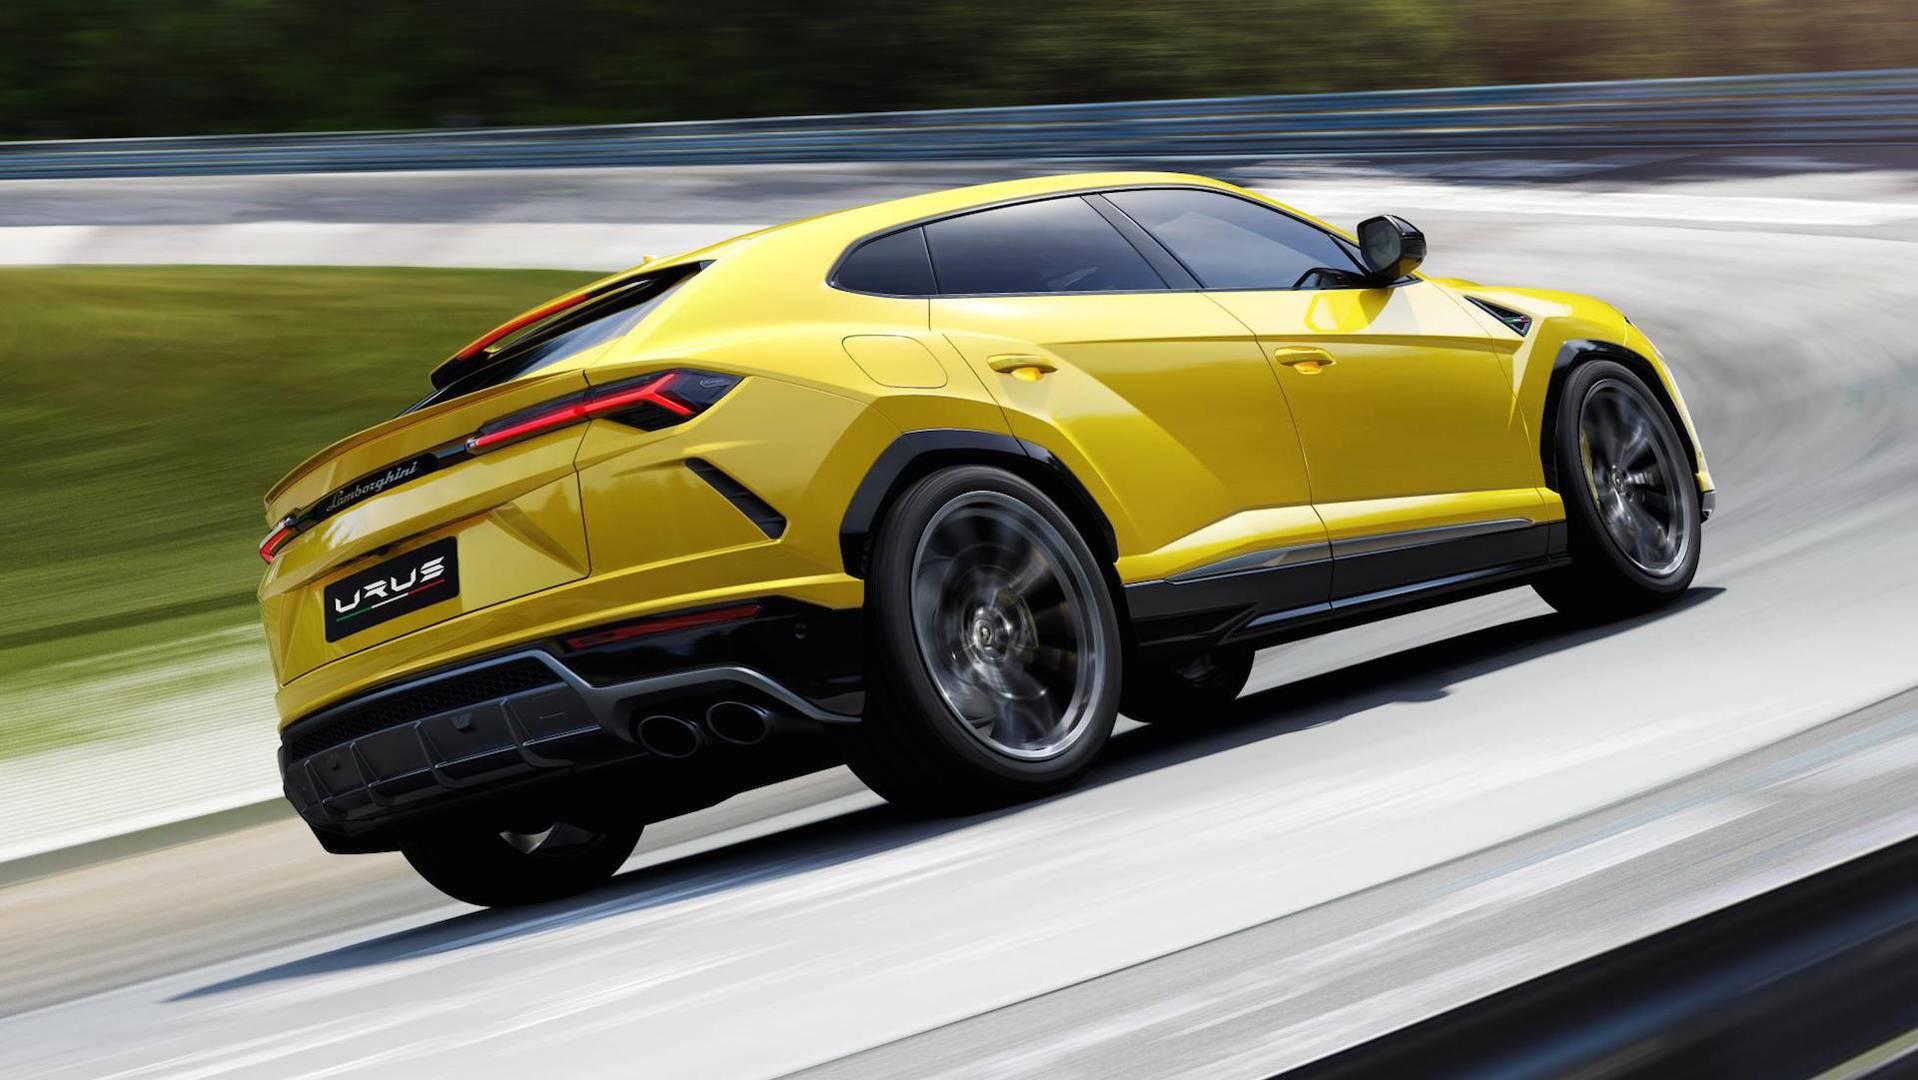 Le Lamborghini Urus Est Deja Un Succes Commercial